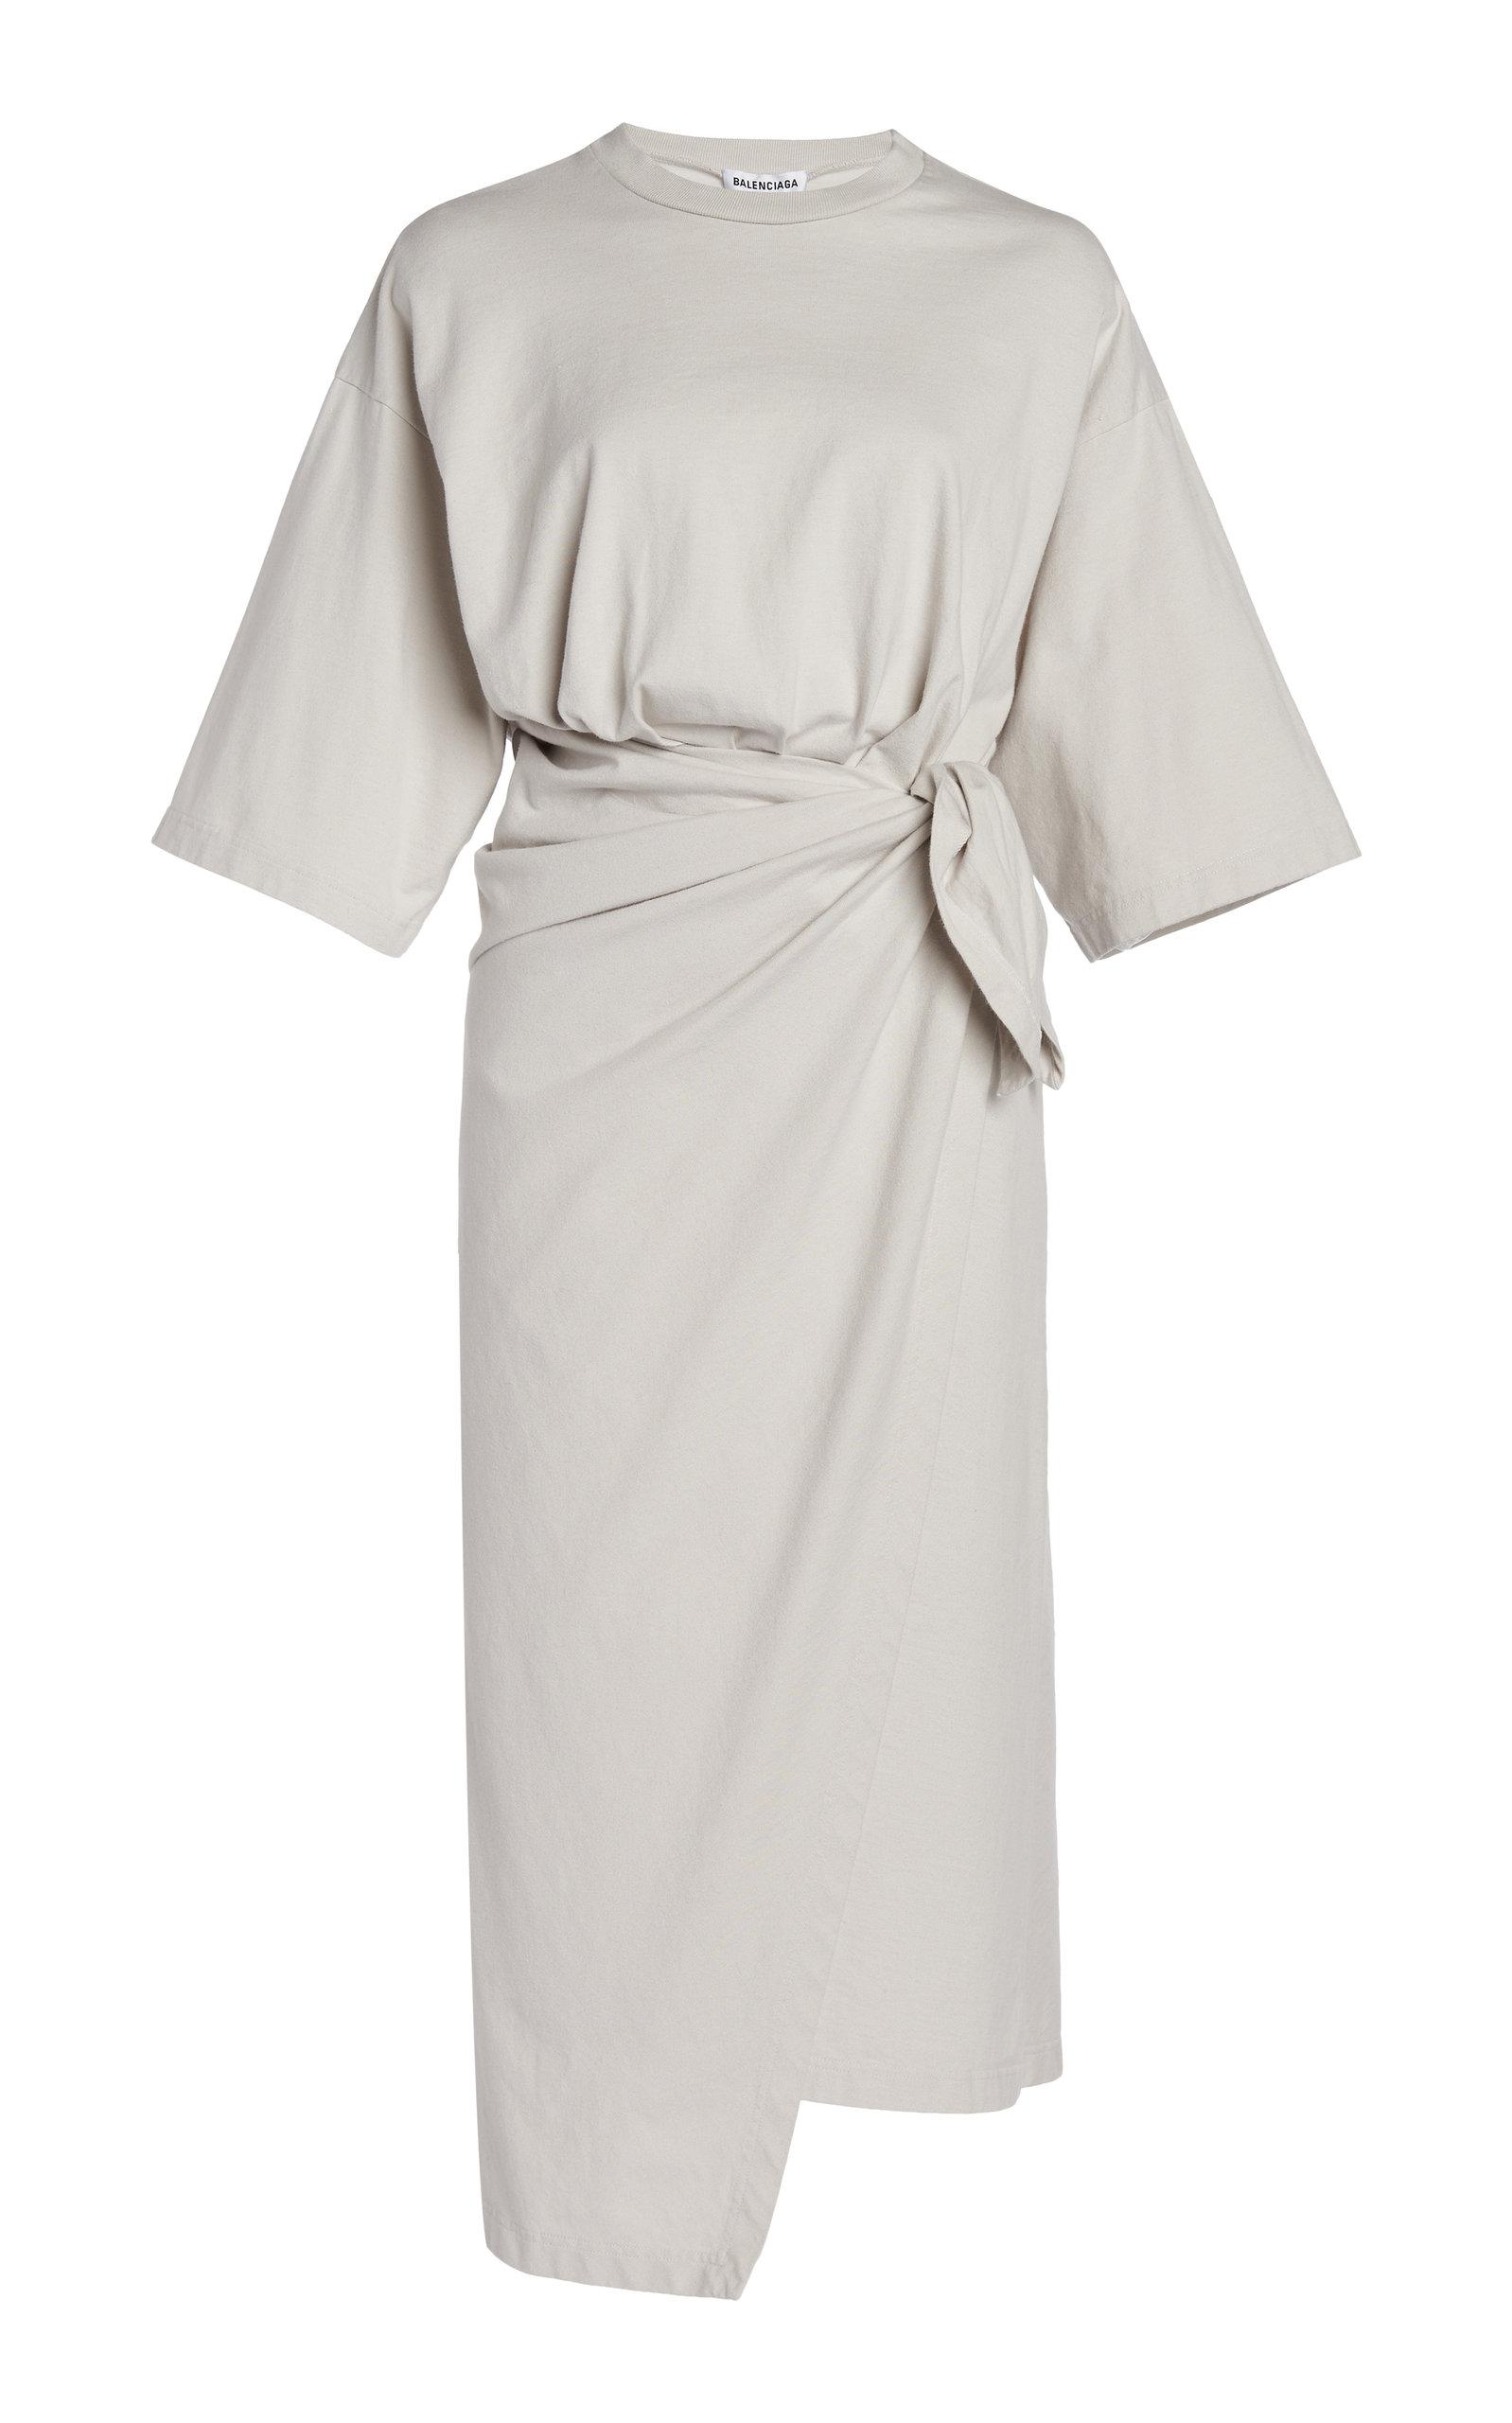 Balenciaga WOMEN'S COTTON JERSEY WRAP-EFFECT MIDI T-SHIRT DRESS